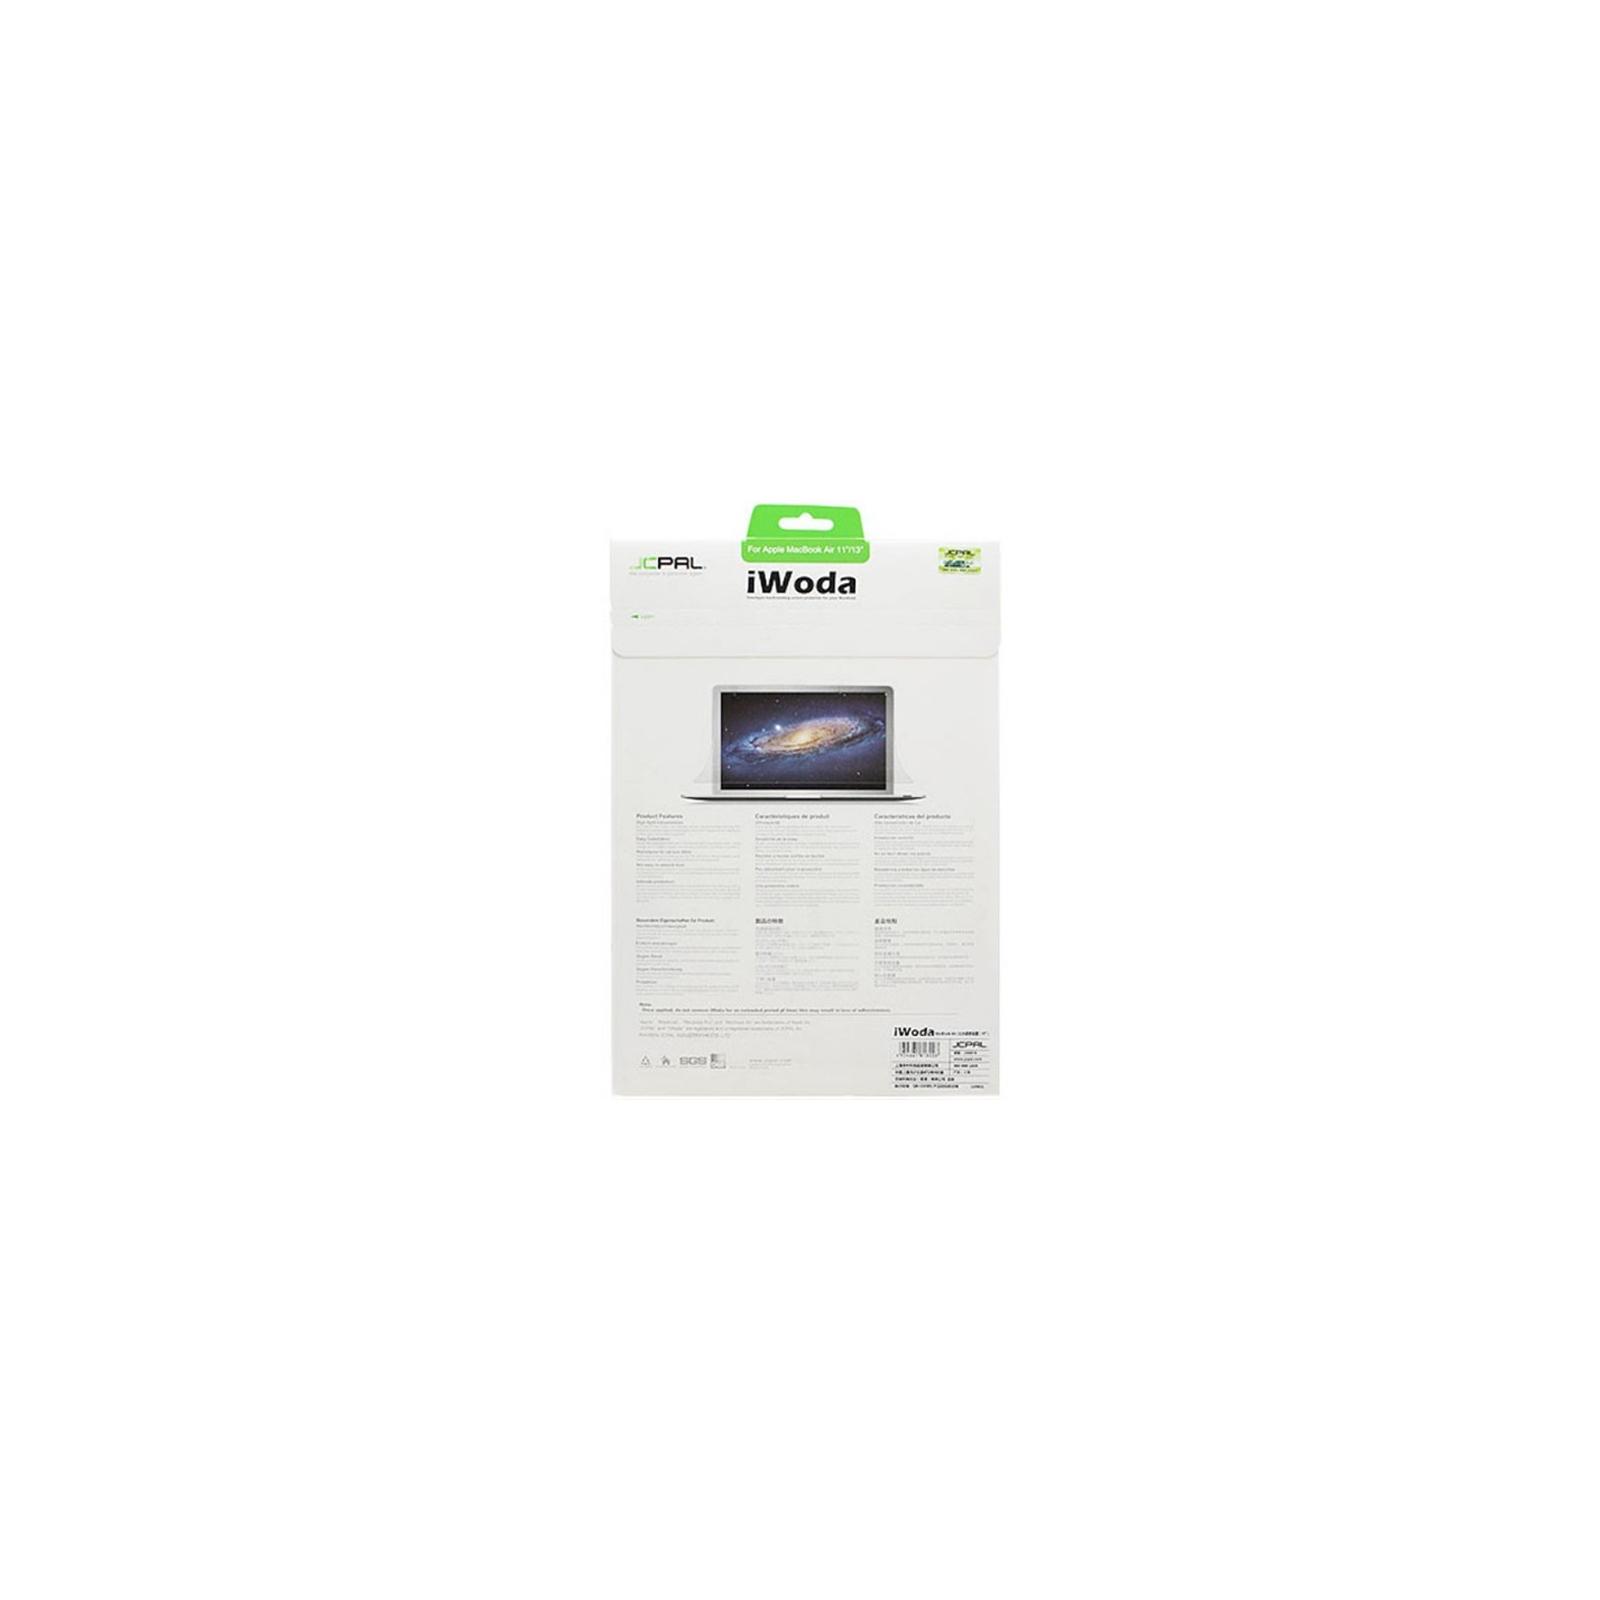 Пленка защитная JCPAL iWoda для MacBook Air 11 (High Transparency) (JCP2009) изображение 2